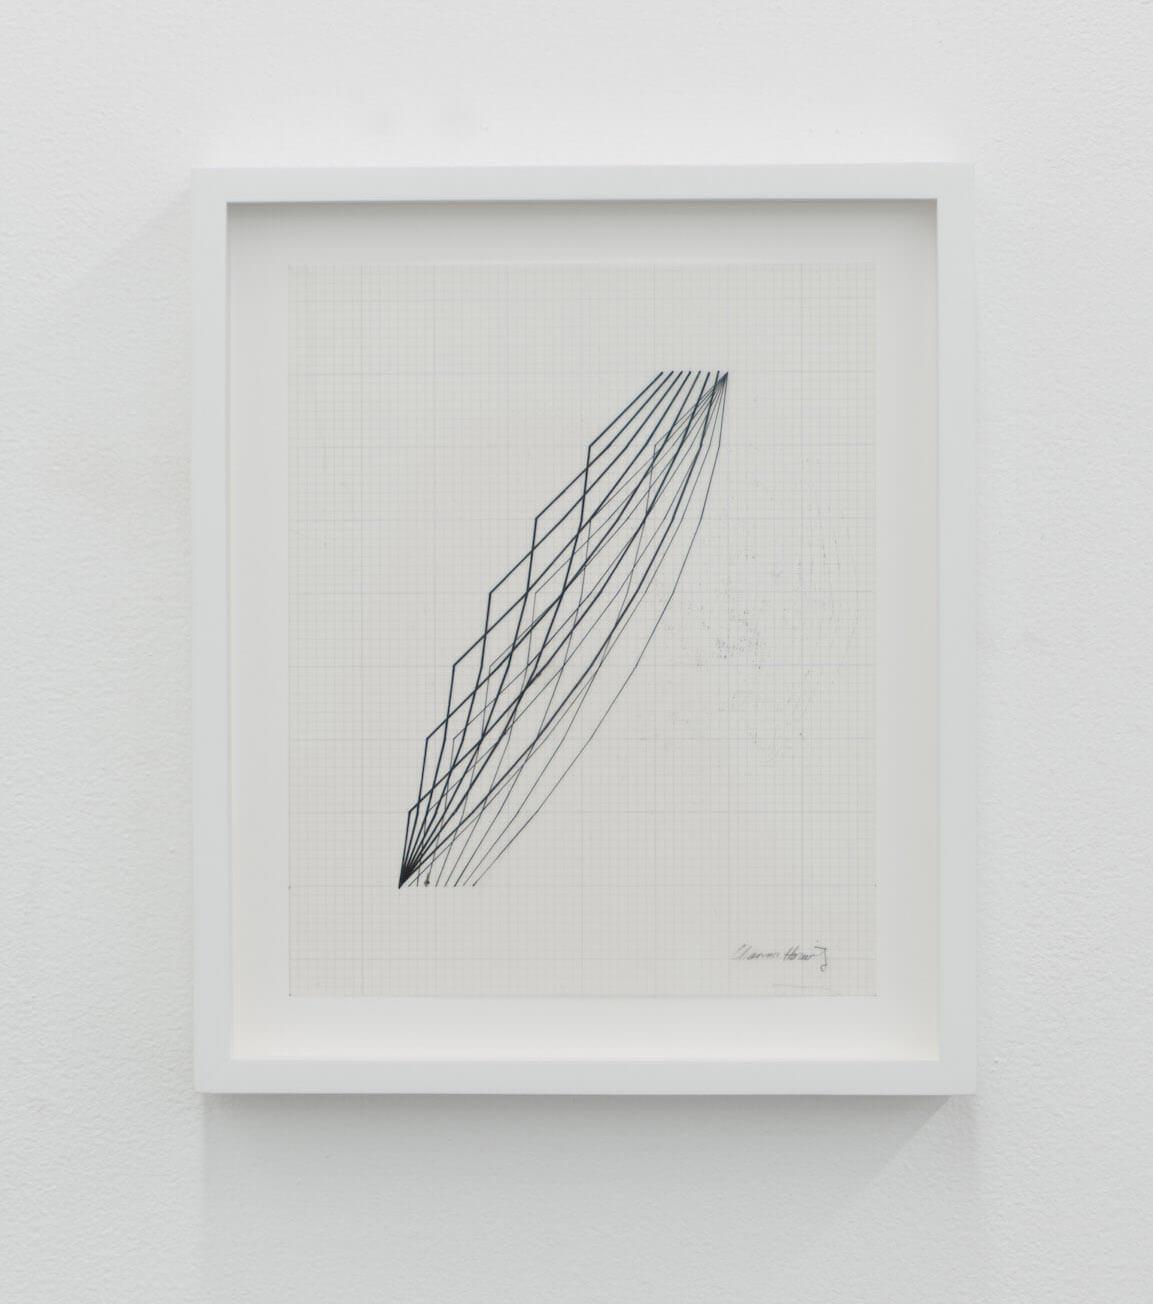 Horwitz, Structure, nd (CH 18.003)(#955)x